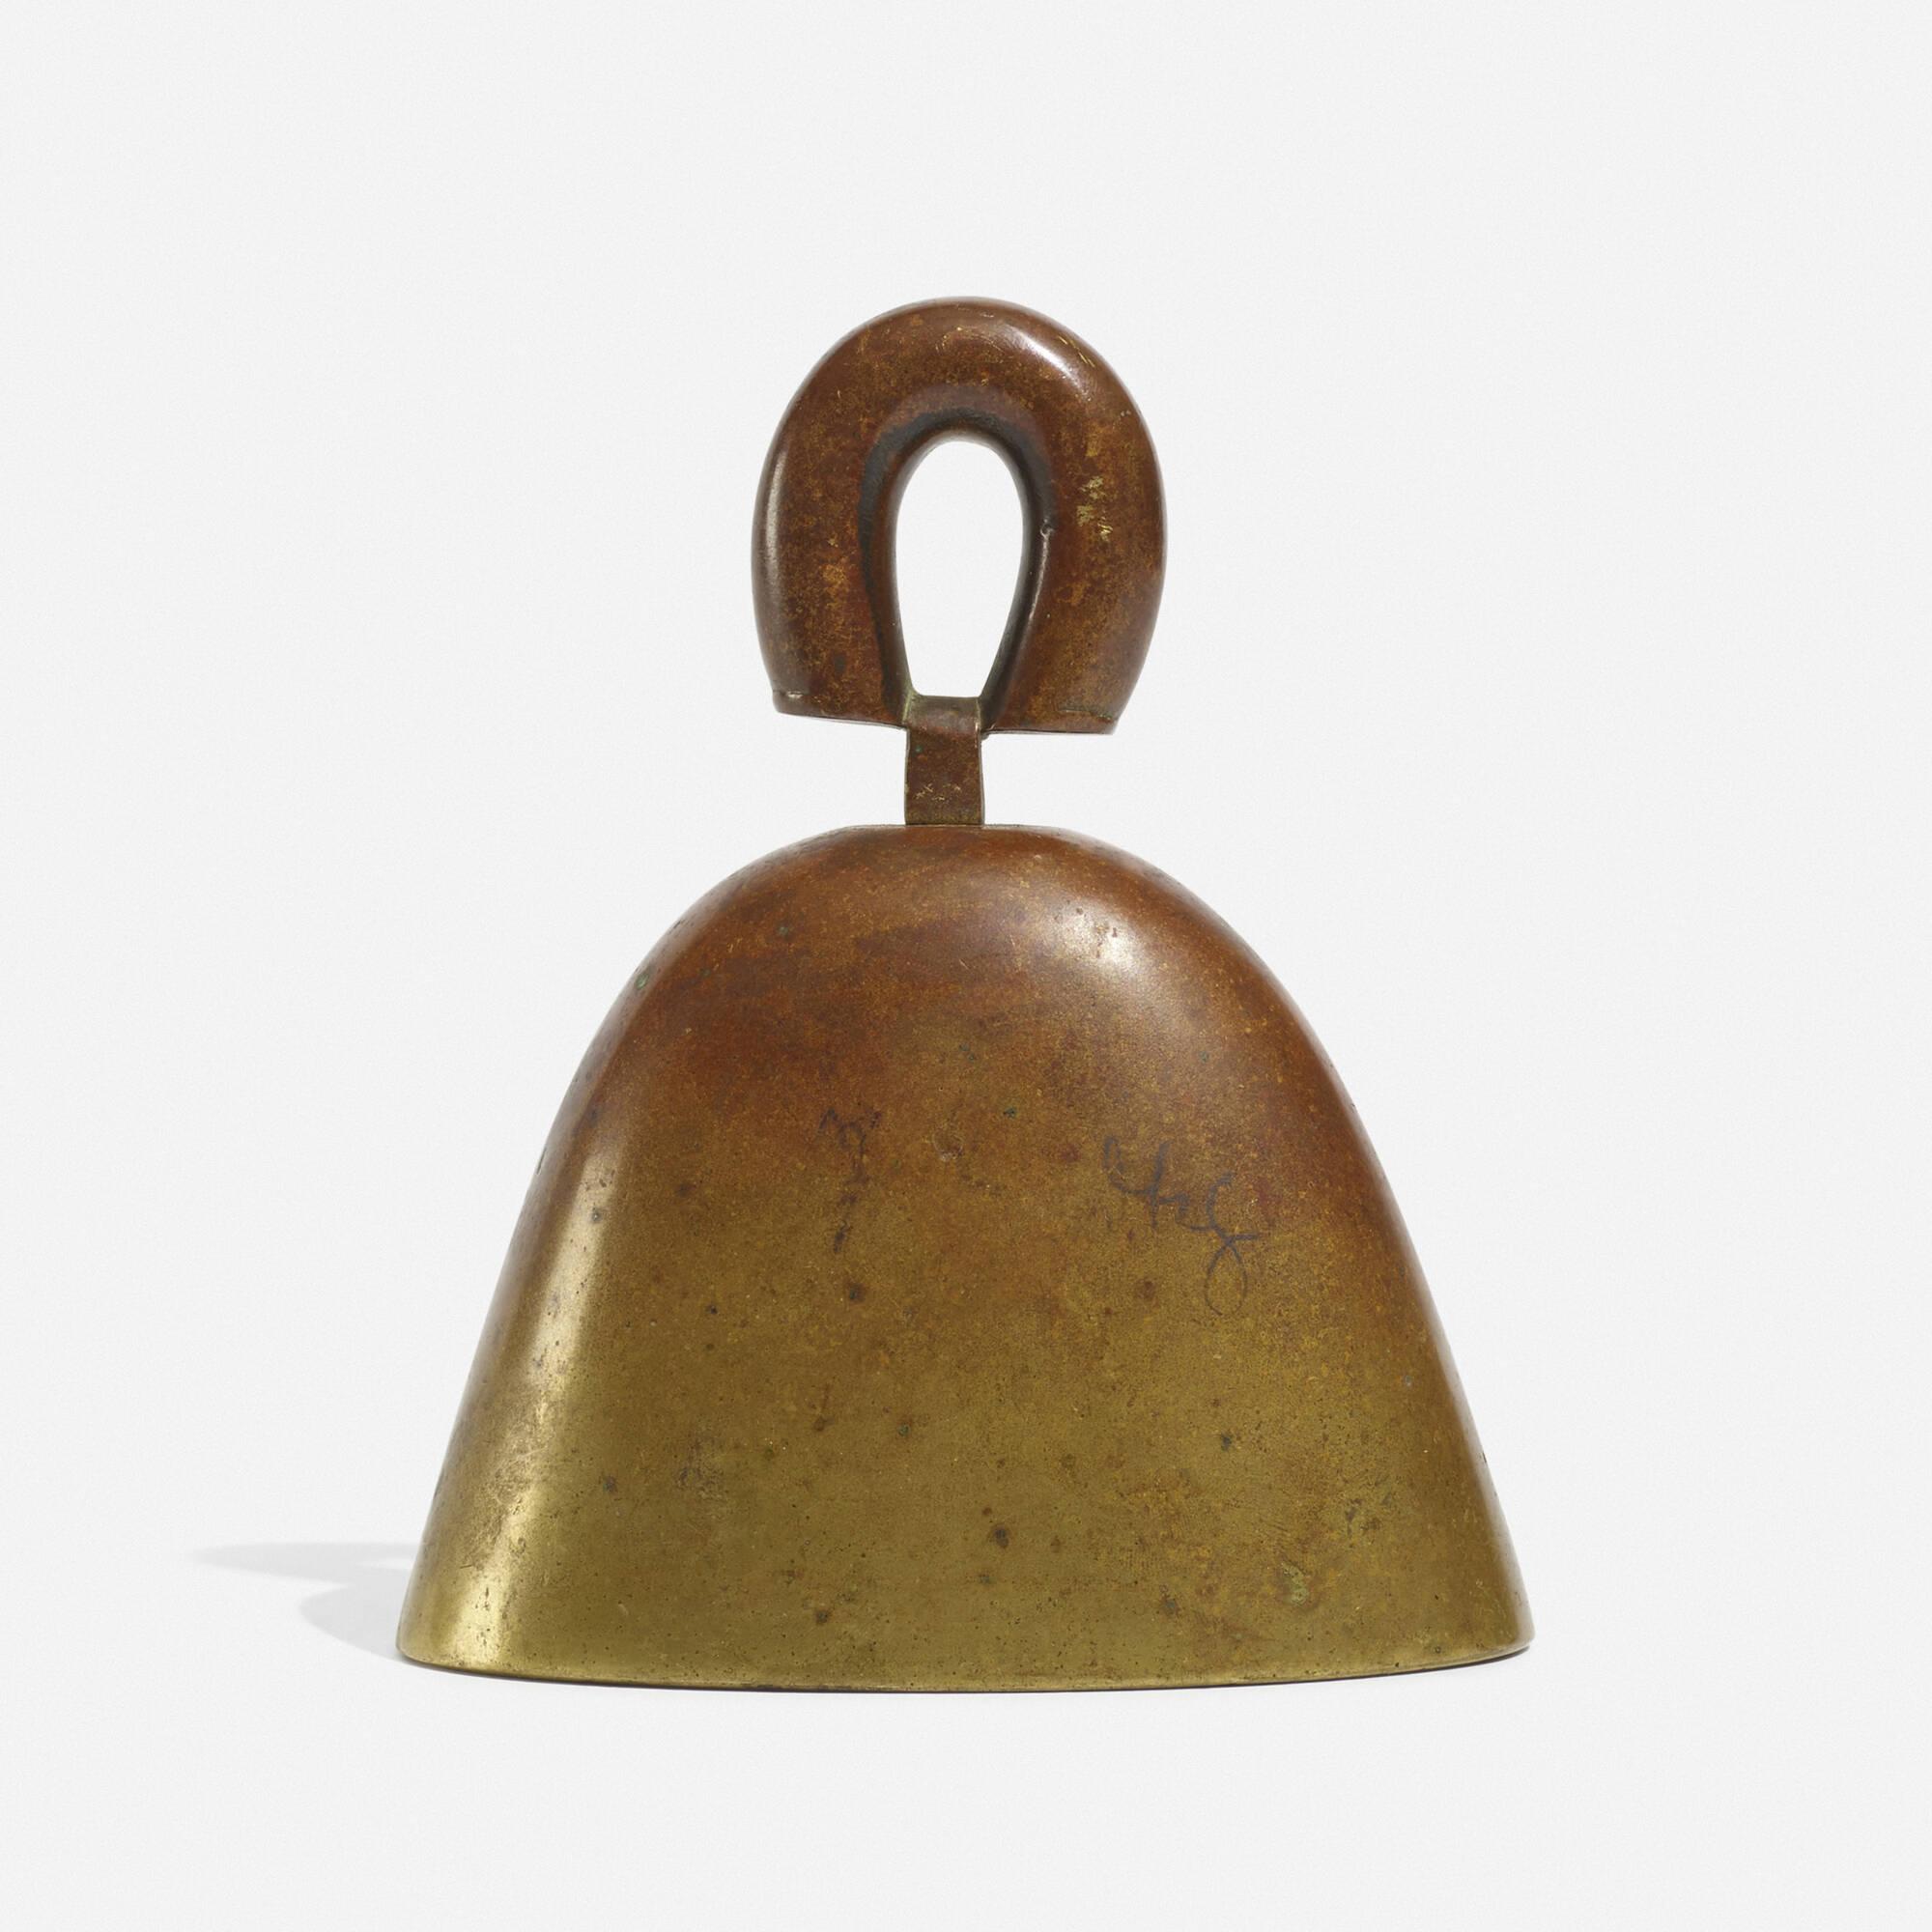 314: Carl Auböck II / dinner bell (1 of 3)